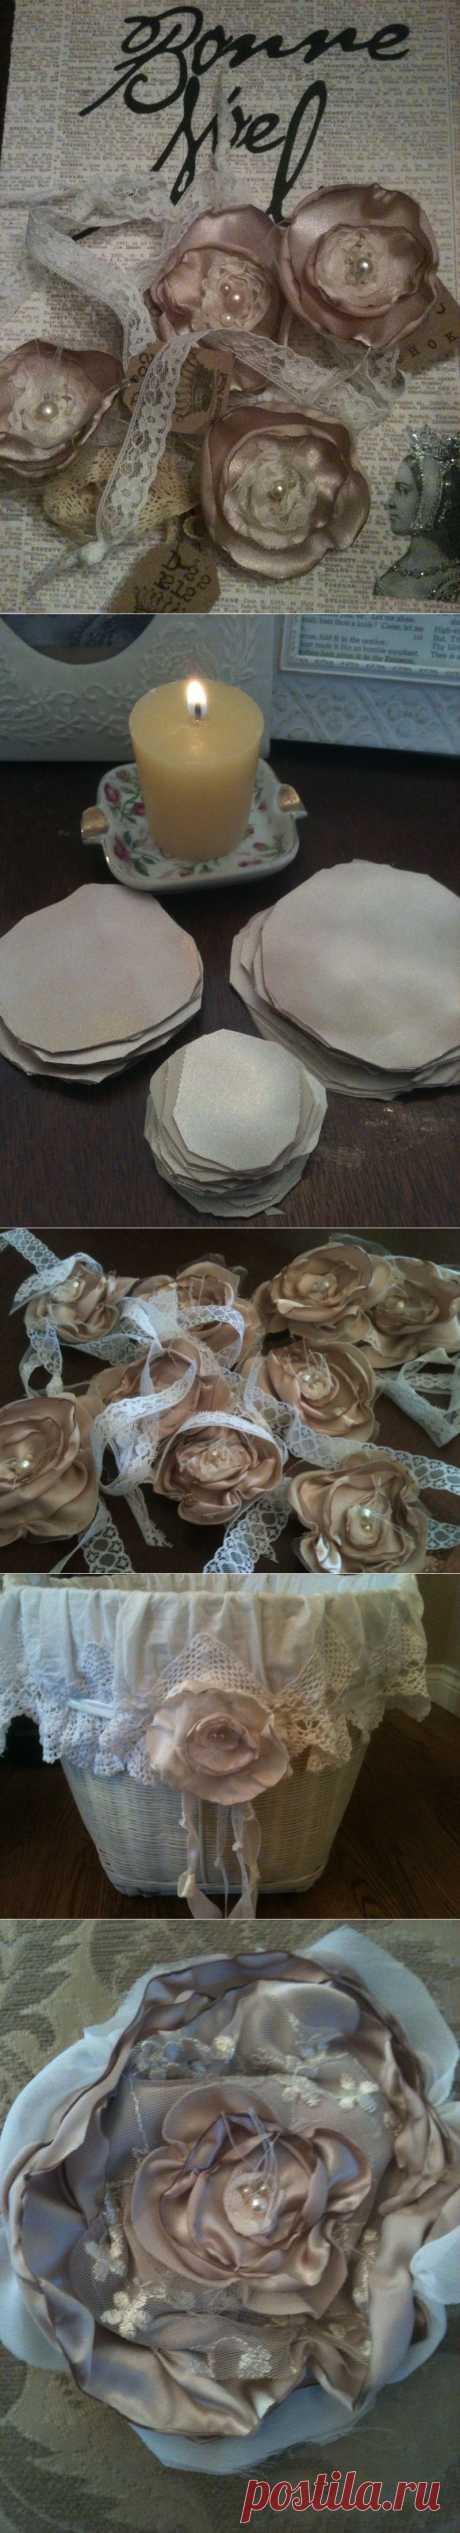 Винтажные цветы от Бонни Брунс. Мастер-класс.